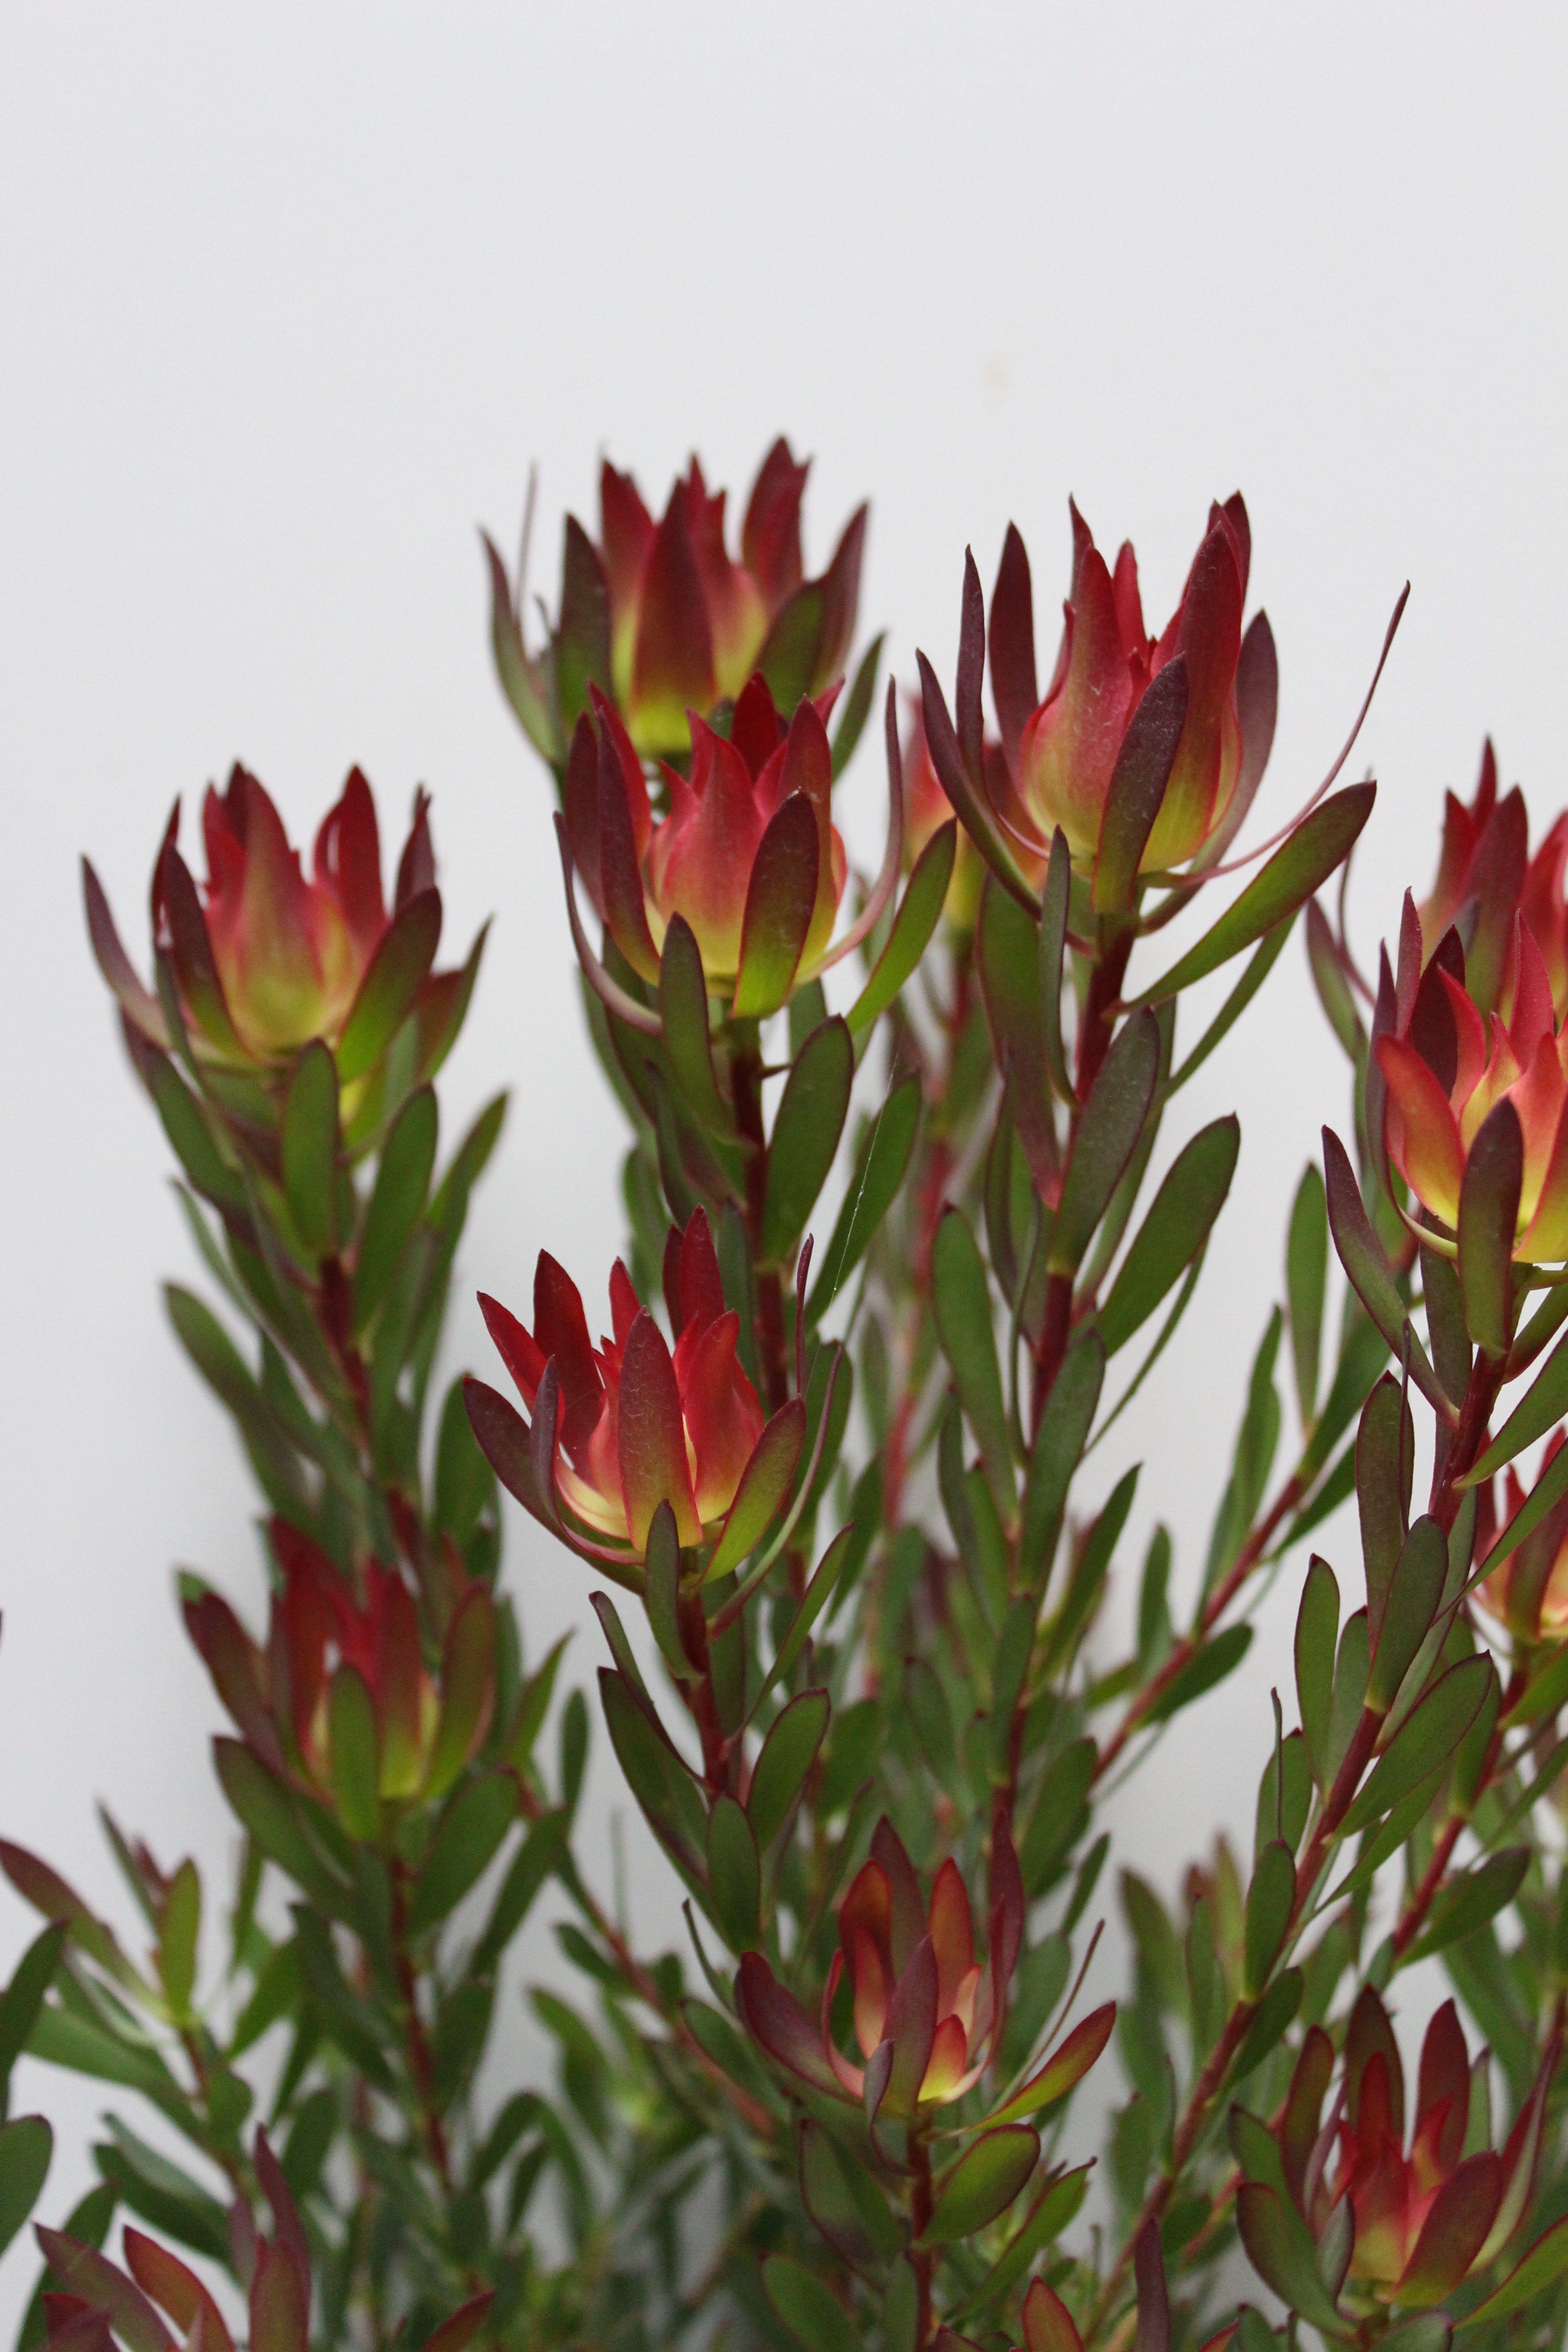 Proteaceae Leucadendron Leucadendron Devils Blush Small Shrub Protea Plant Australian Native Flowers Protea Plant Garden Shrubs